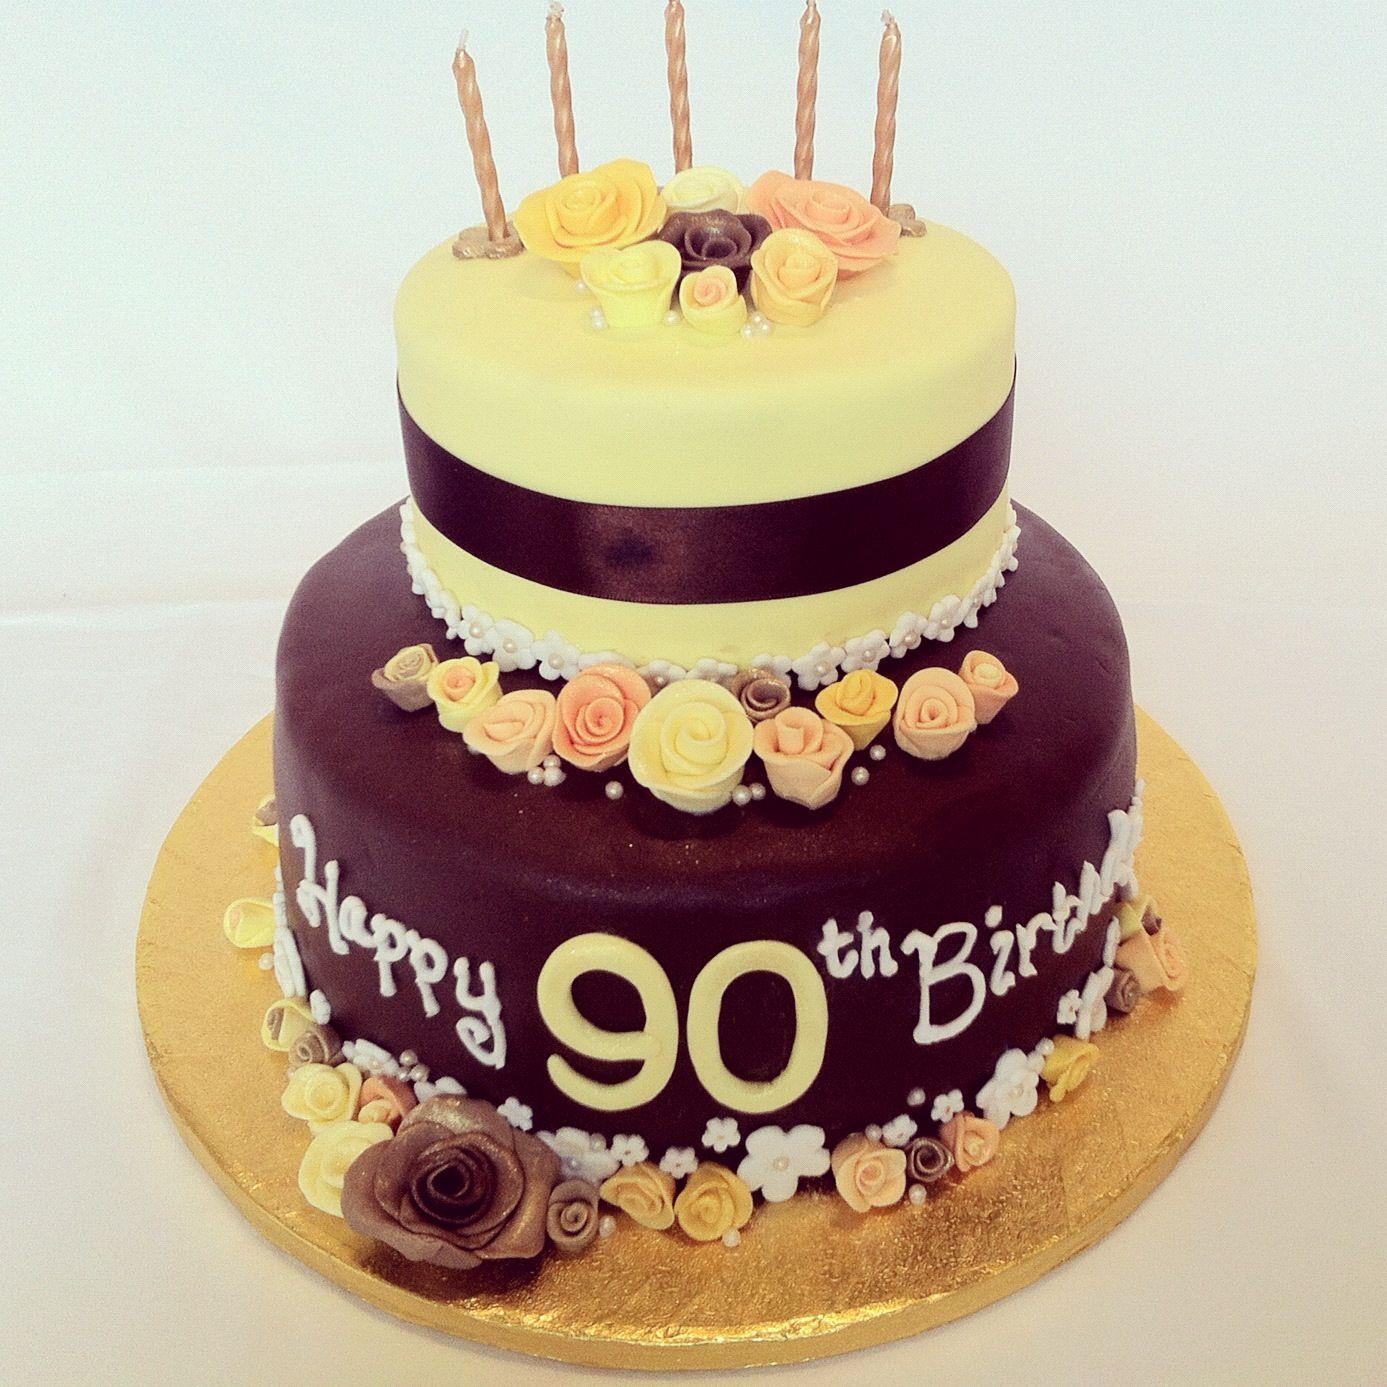 Grandma Anne S 90th Birthday Cake Recipe To Follow 90th Birthday Cakes Cake Birthday Cake